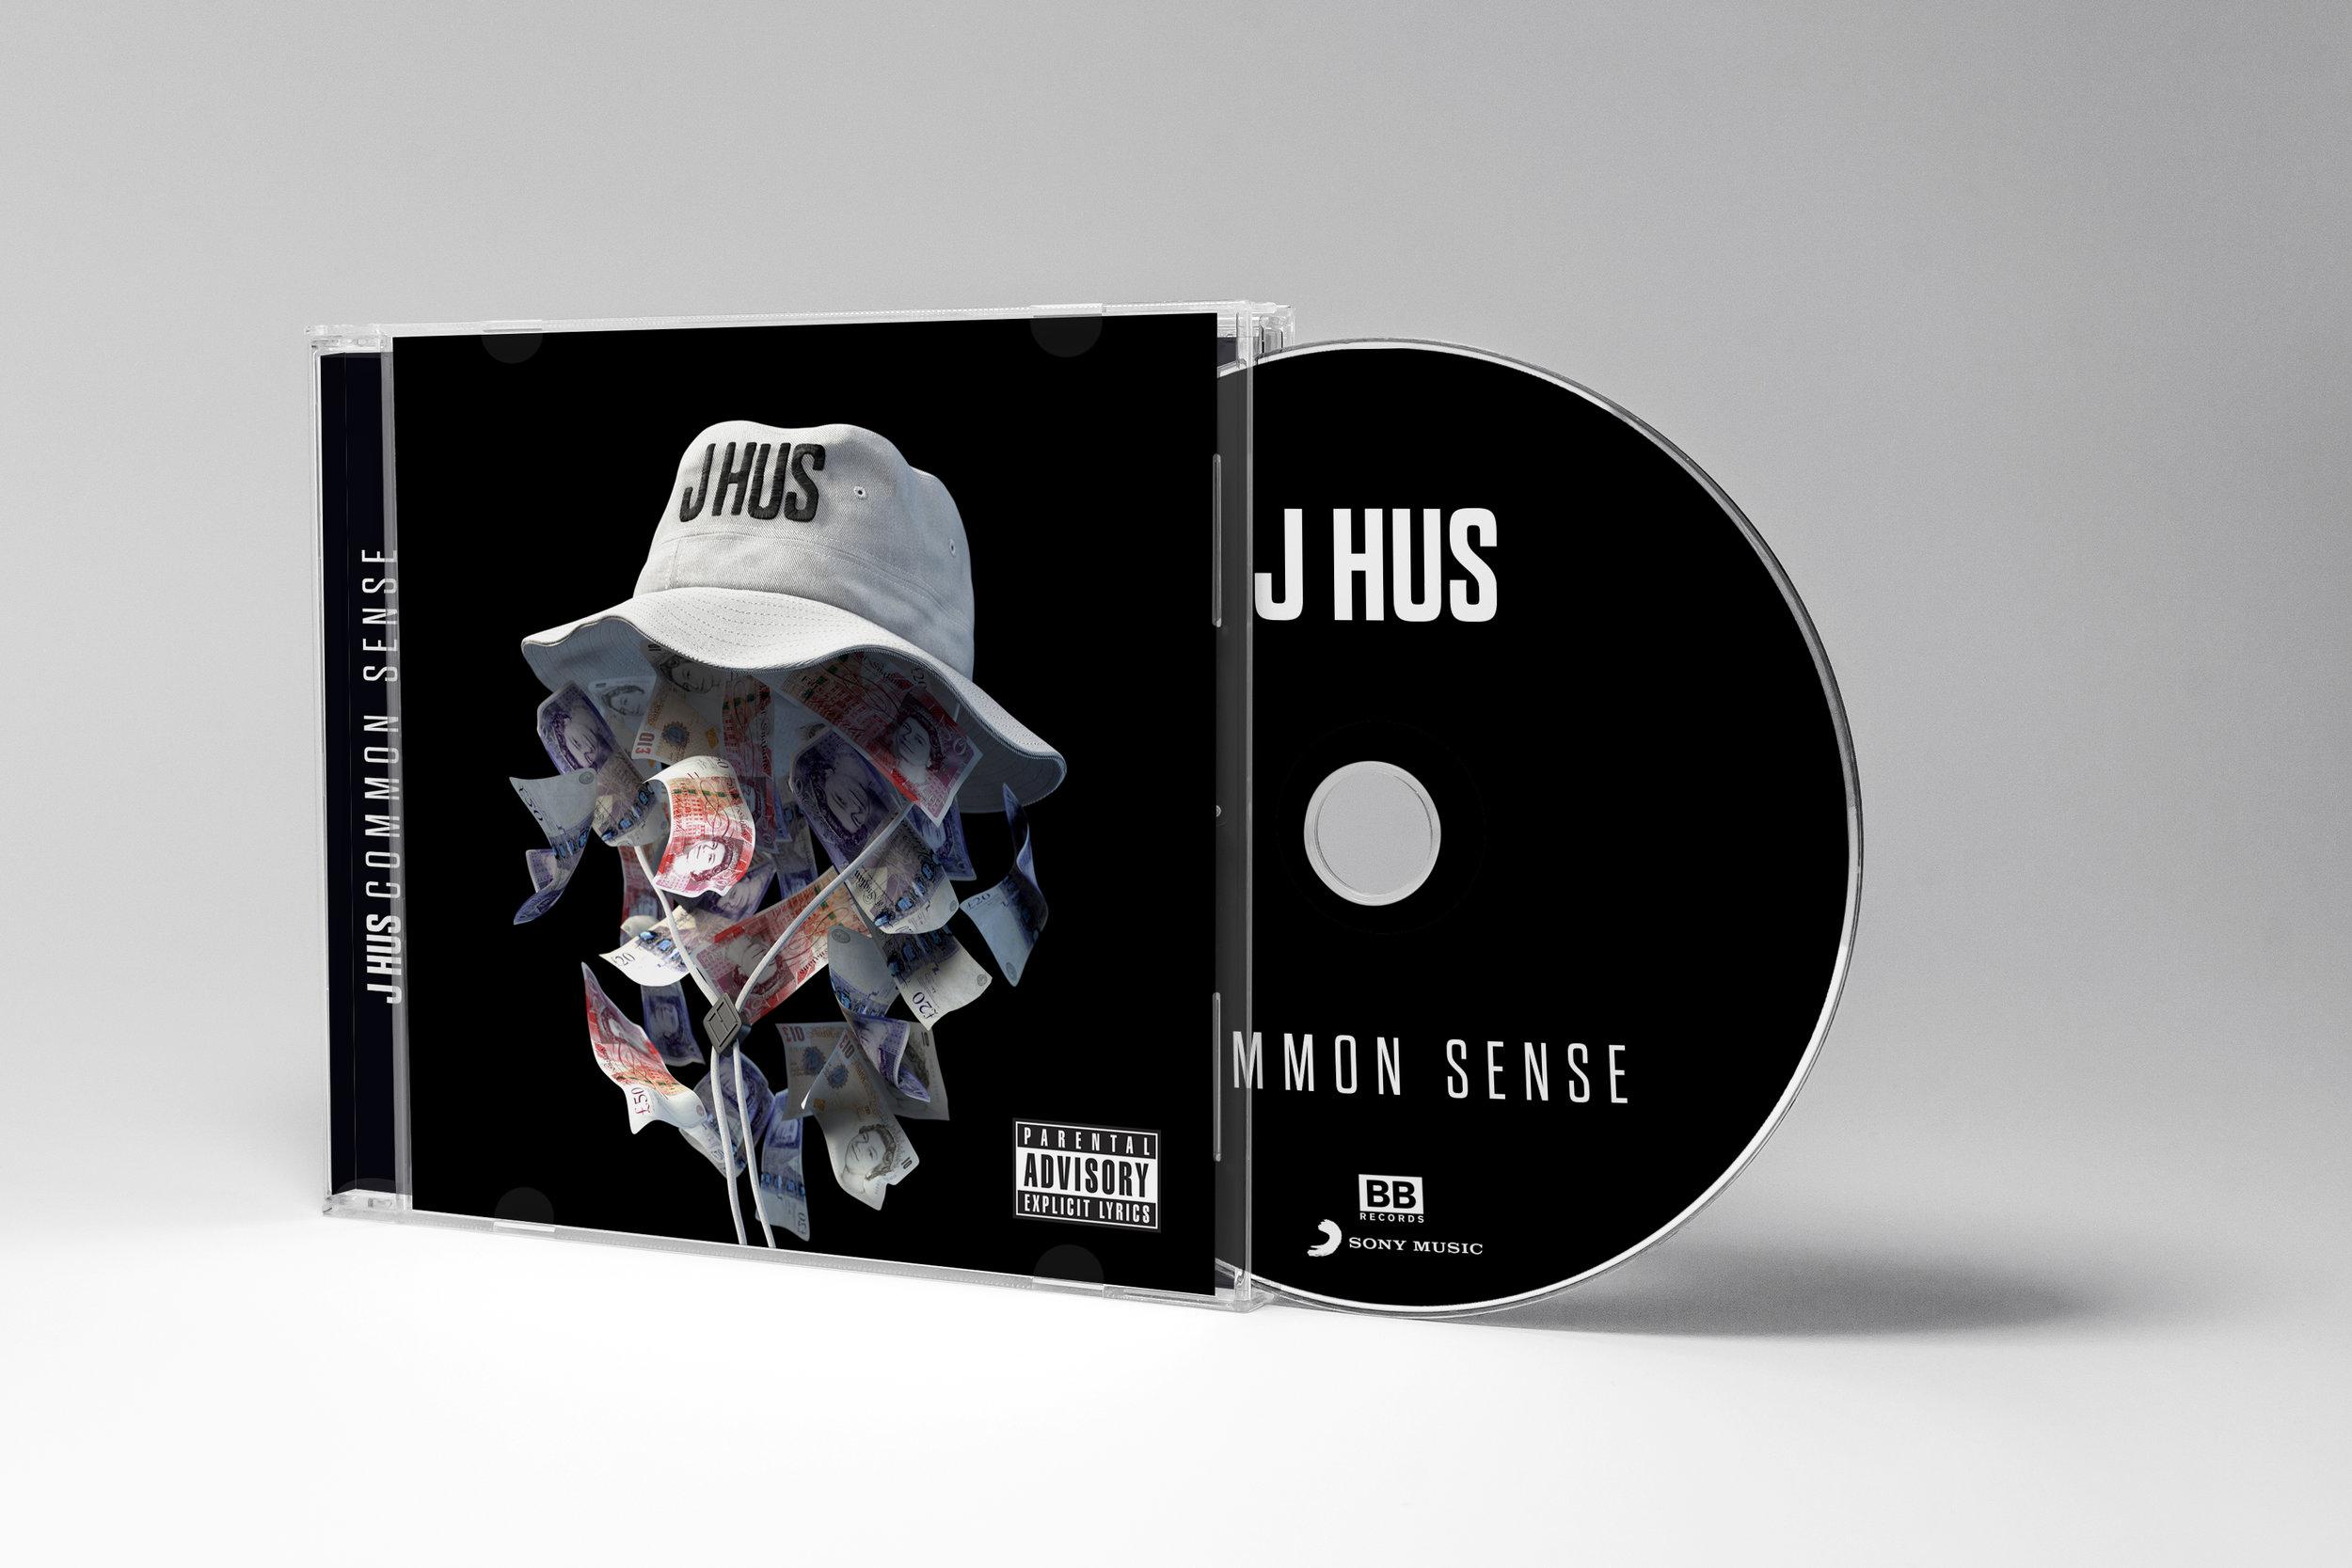 j hus common sense zip album download